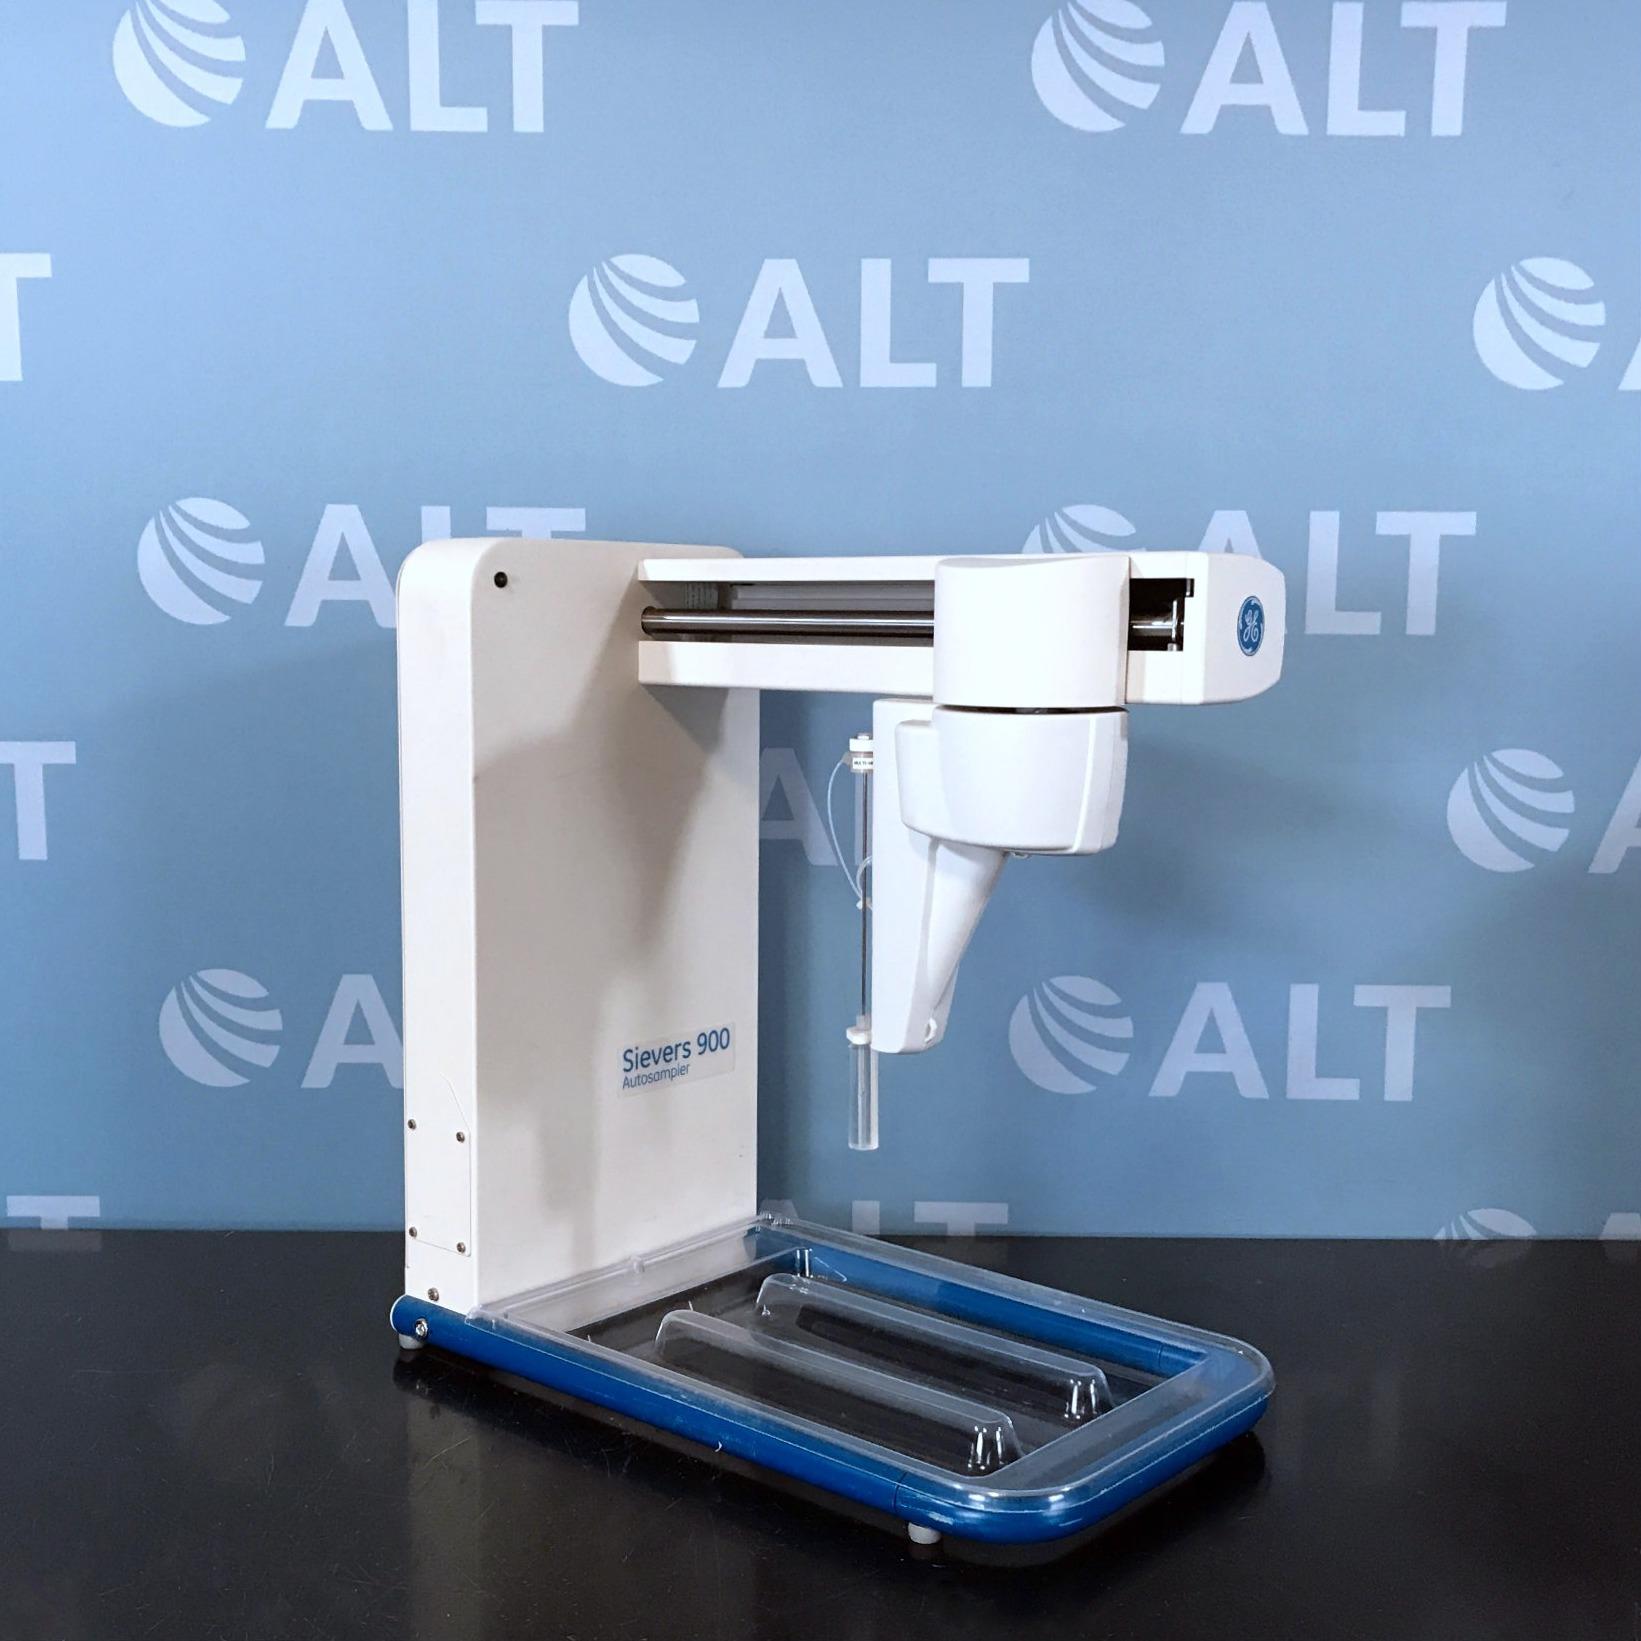 GE Sievers 900 TOC Analyzer with Auto Sampler Image